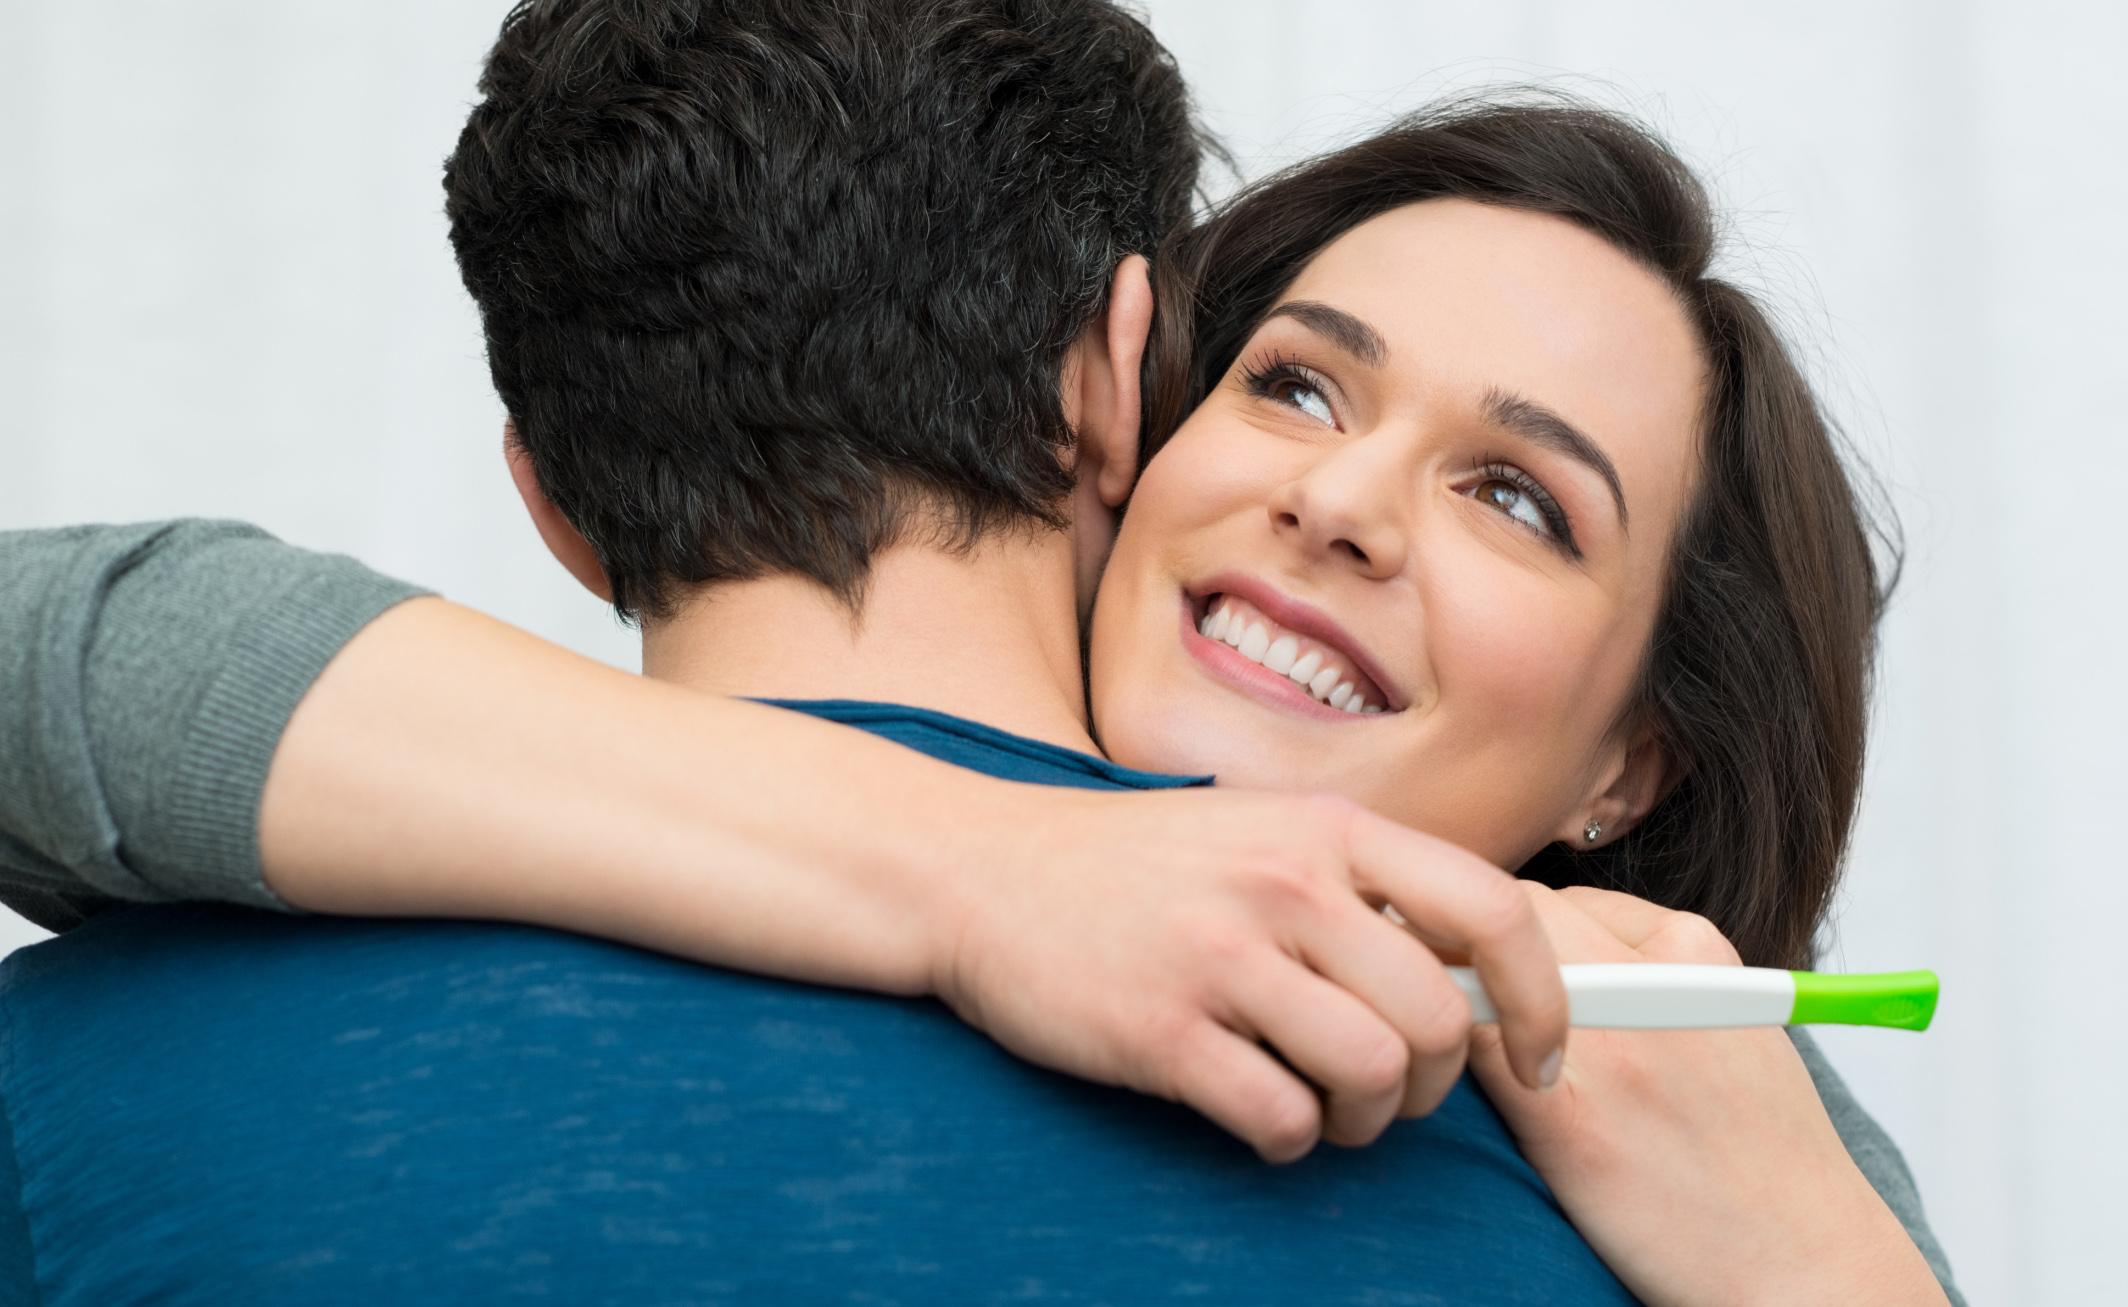 Fertilità: le false convinzioni registrate dai medici | Pazienti.it